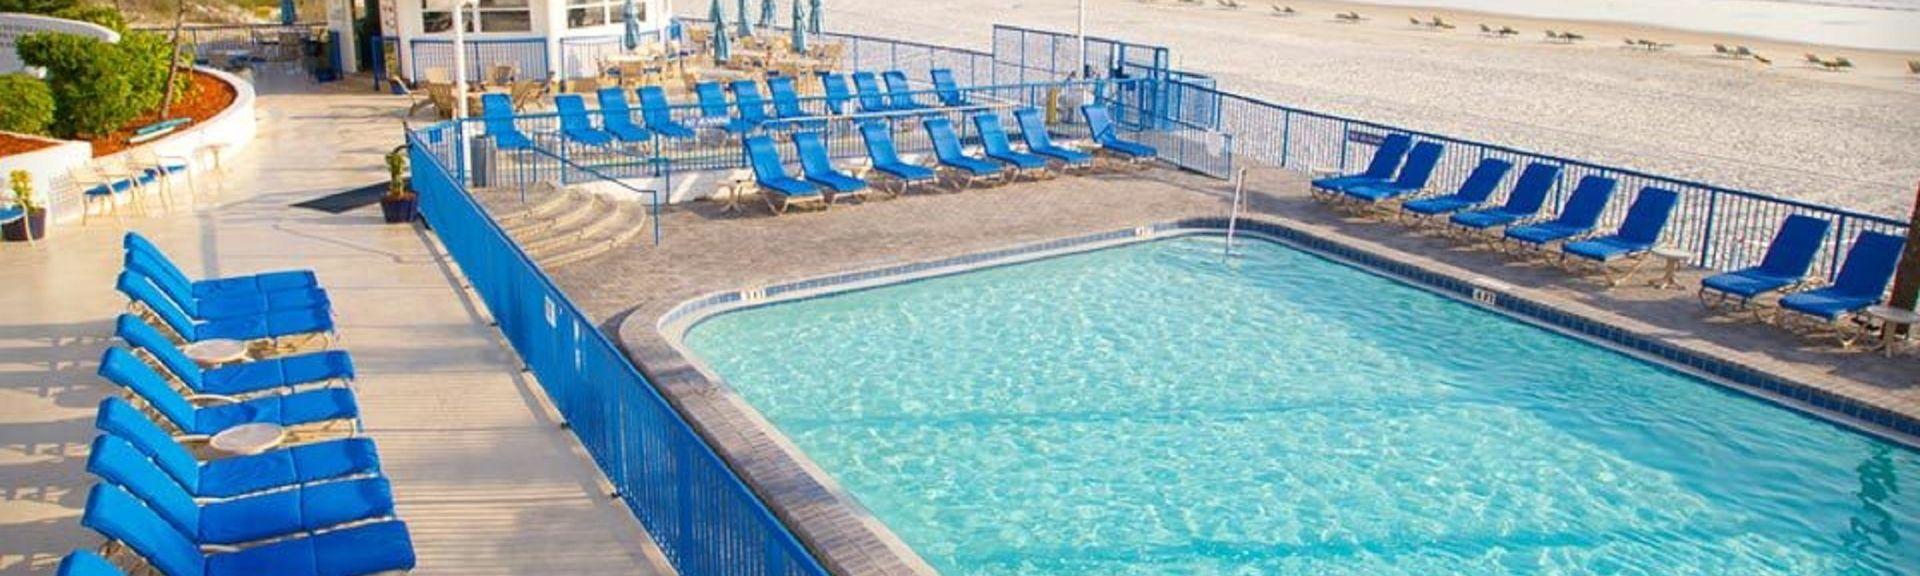 Andrinopoulos Park, Daytona Beach Shores, Florida, Estados Unidos